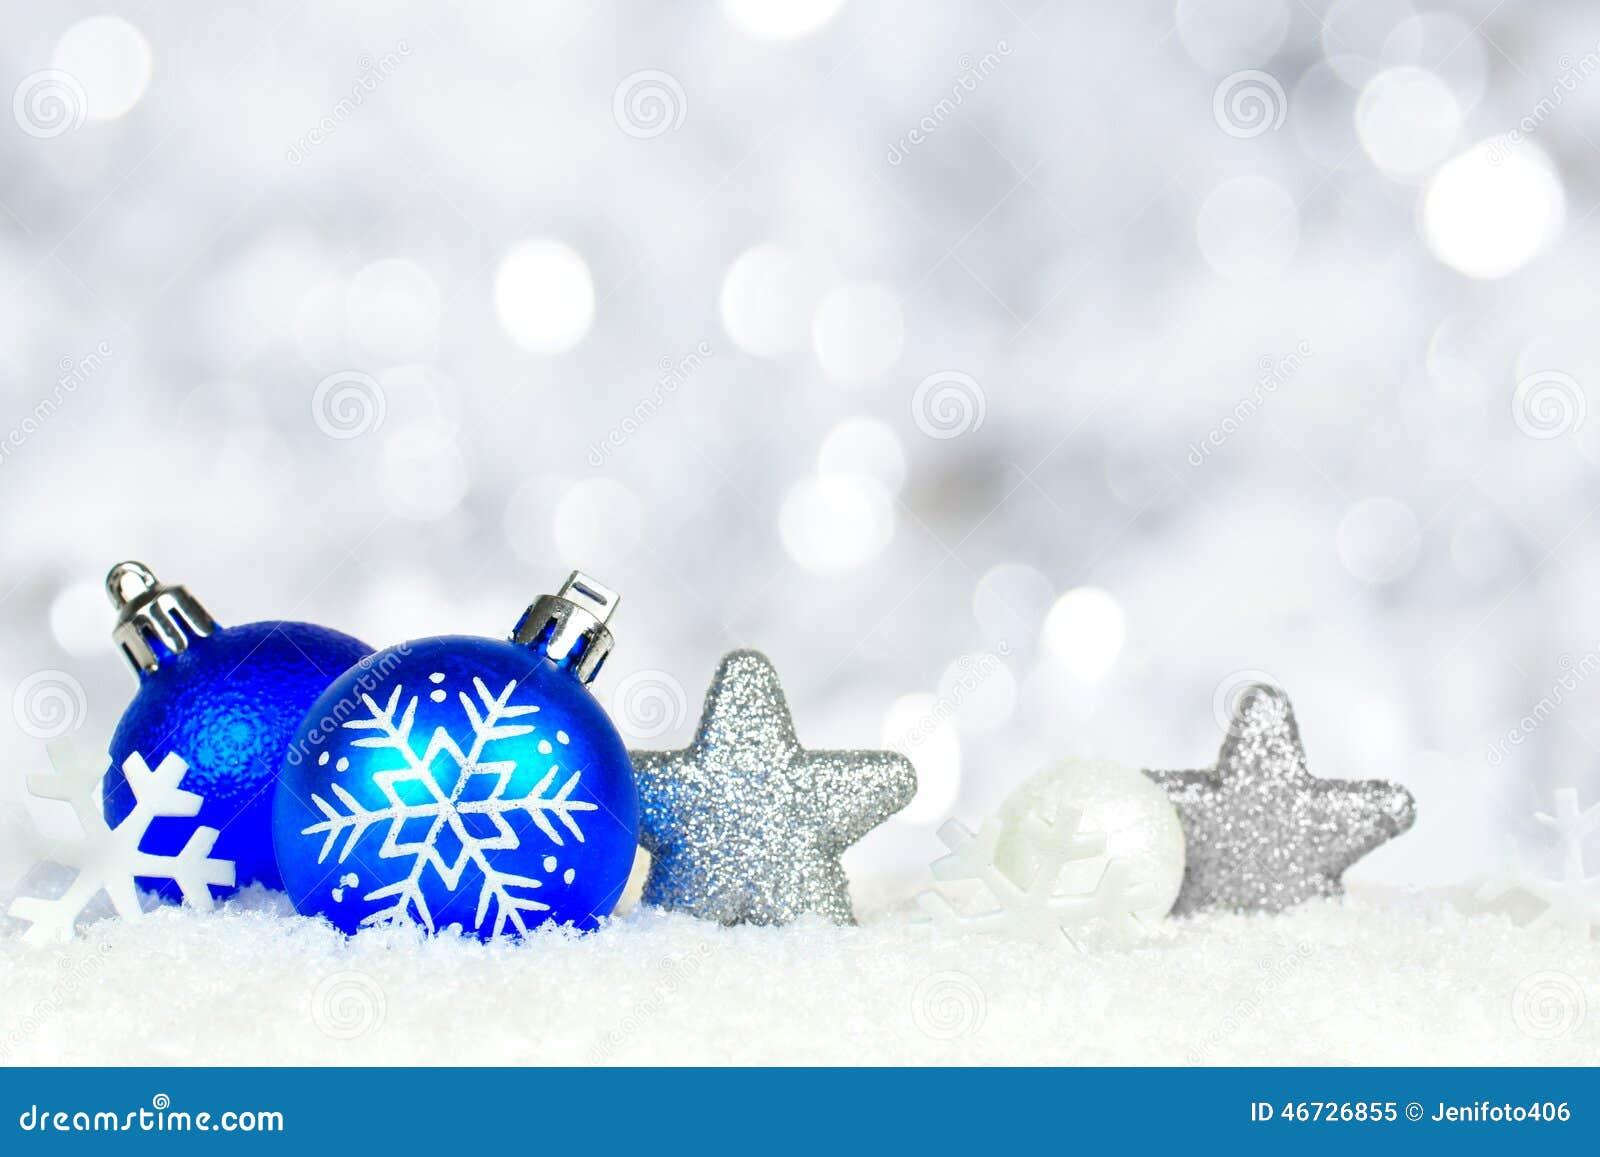 Background Blue Border Christmas Light Lights Ornament